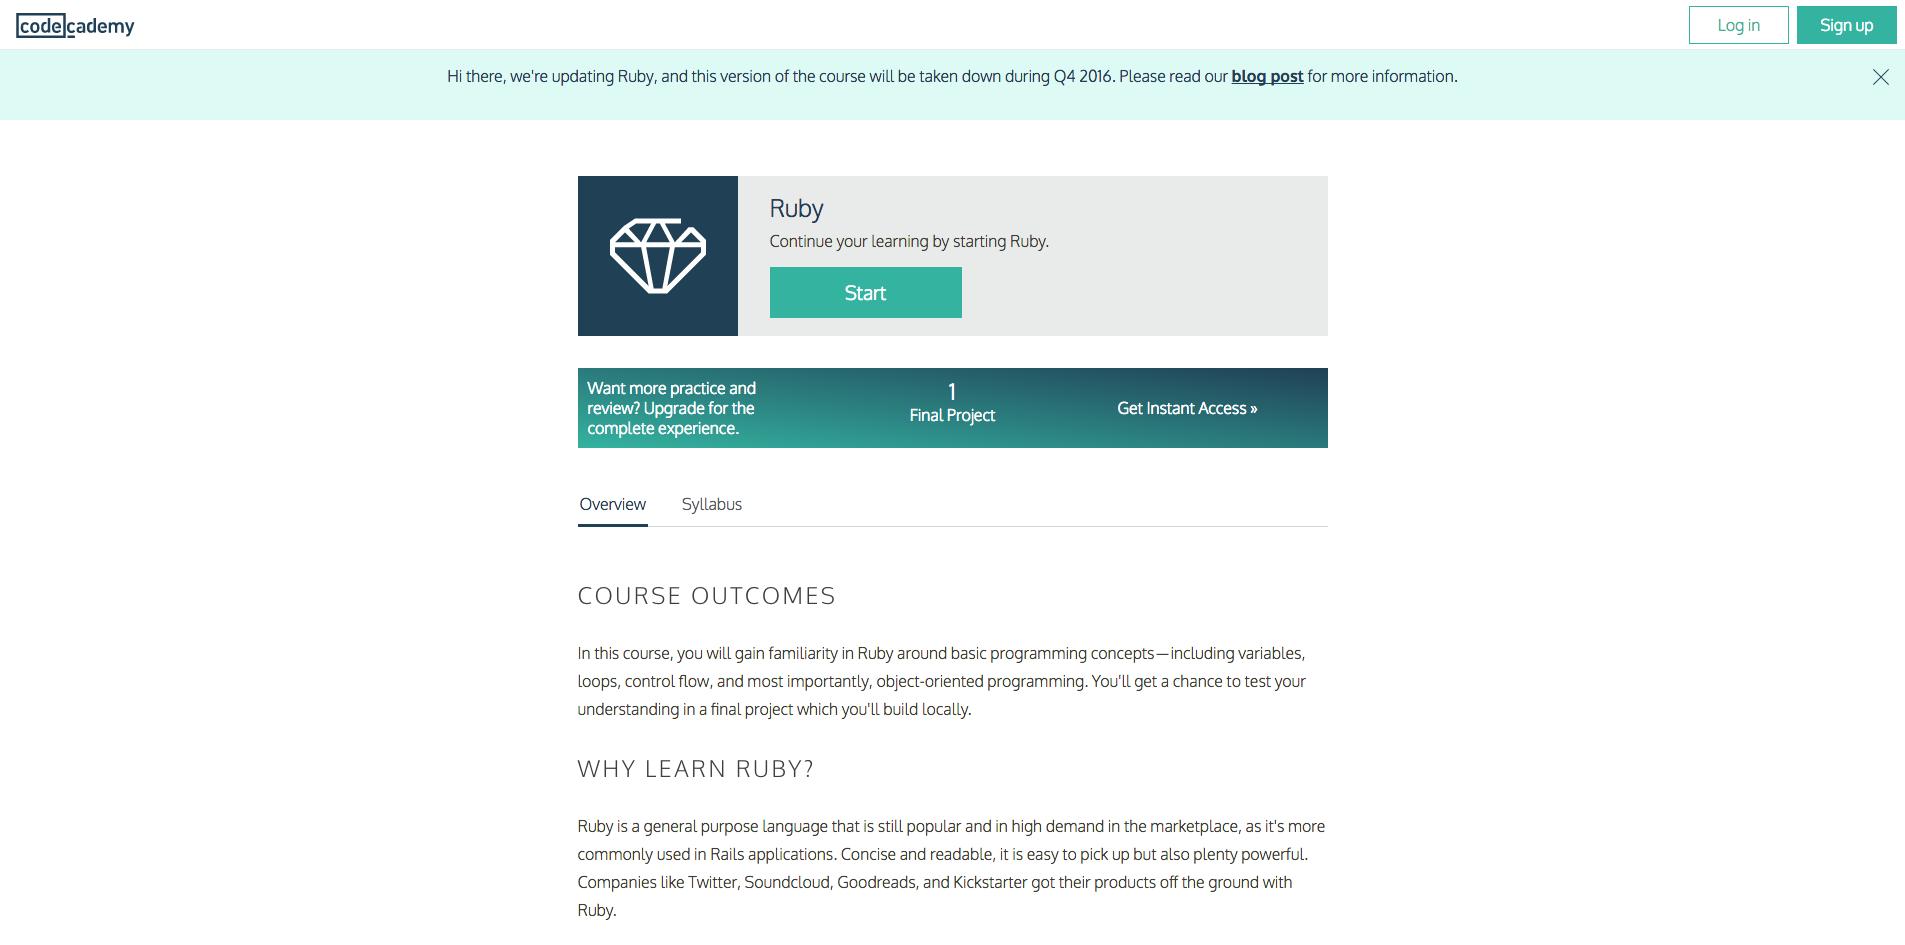 Code academy ruby